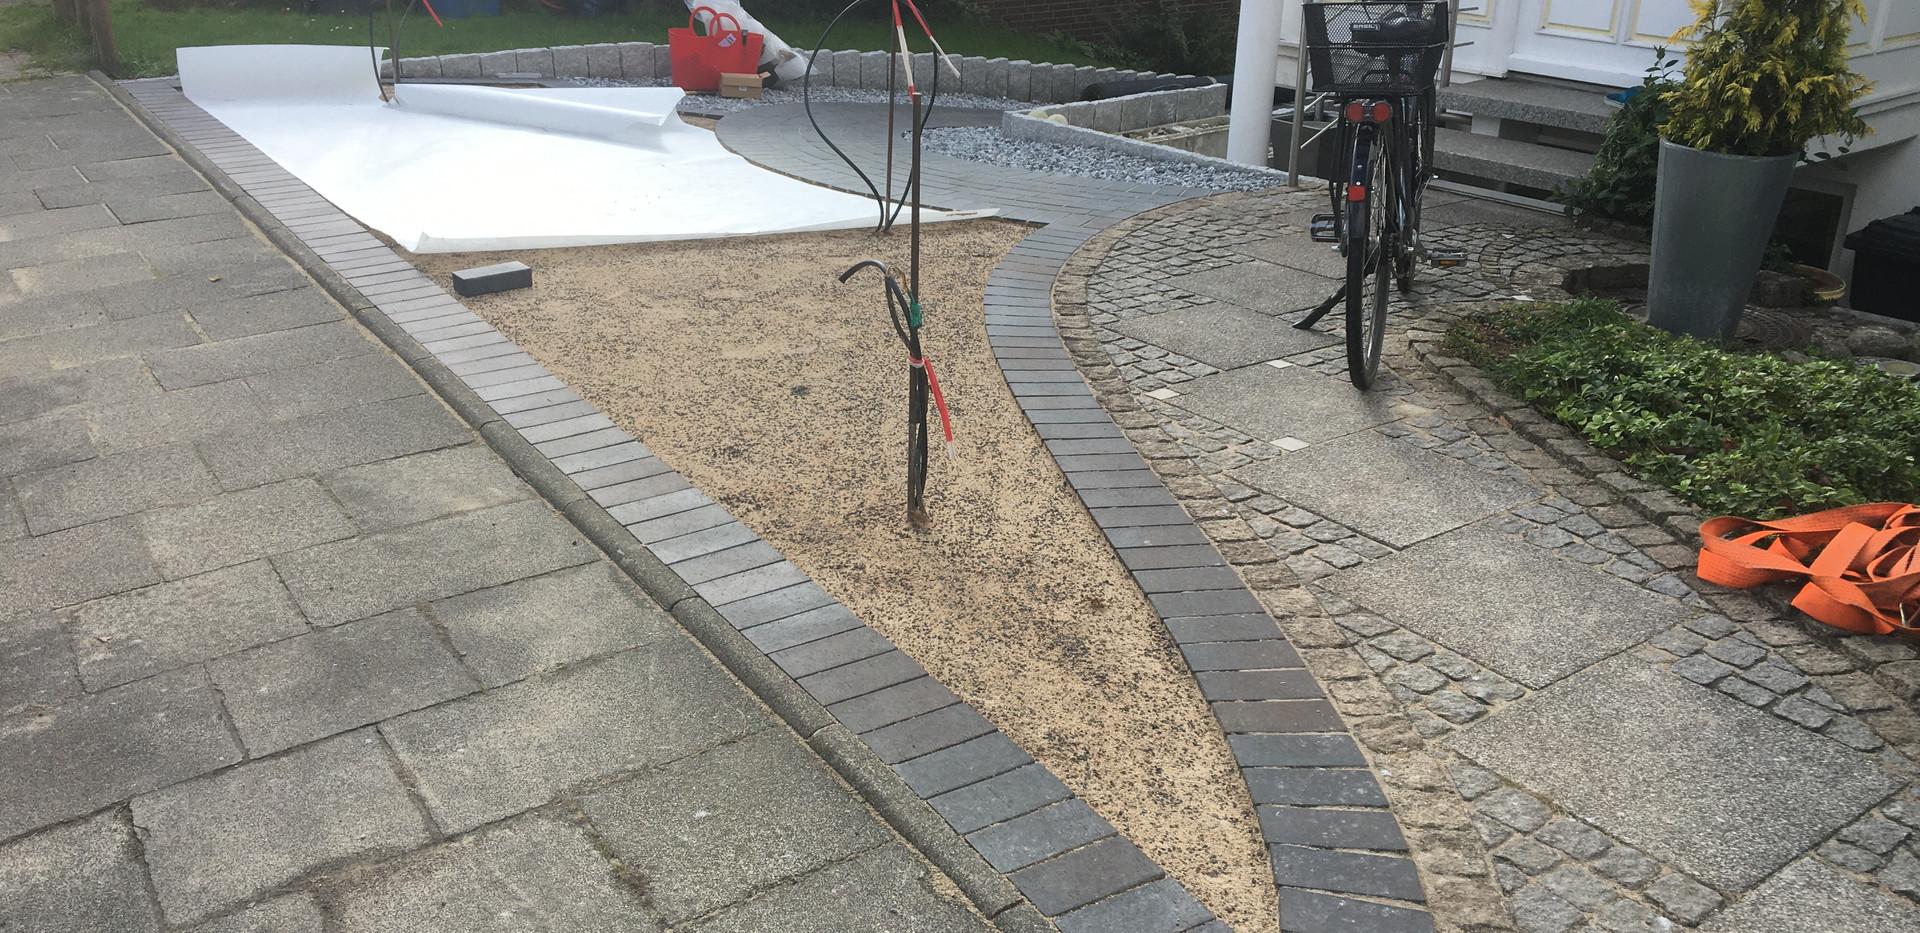 Kunstrasen-Garten-Verlegung.JPG